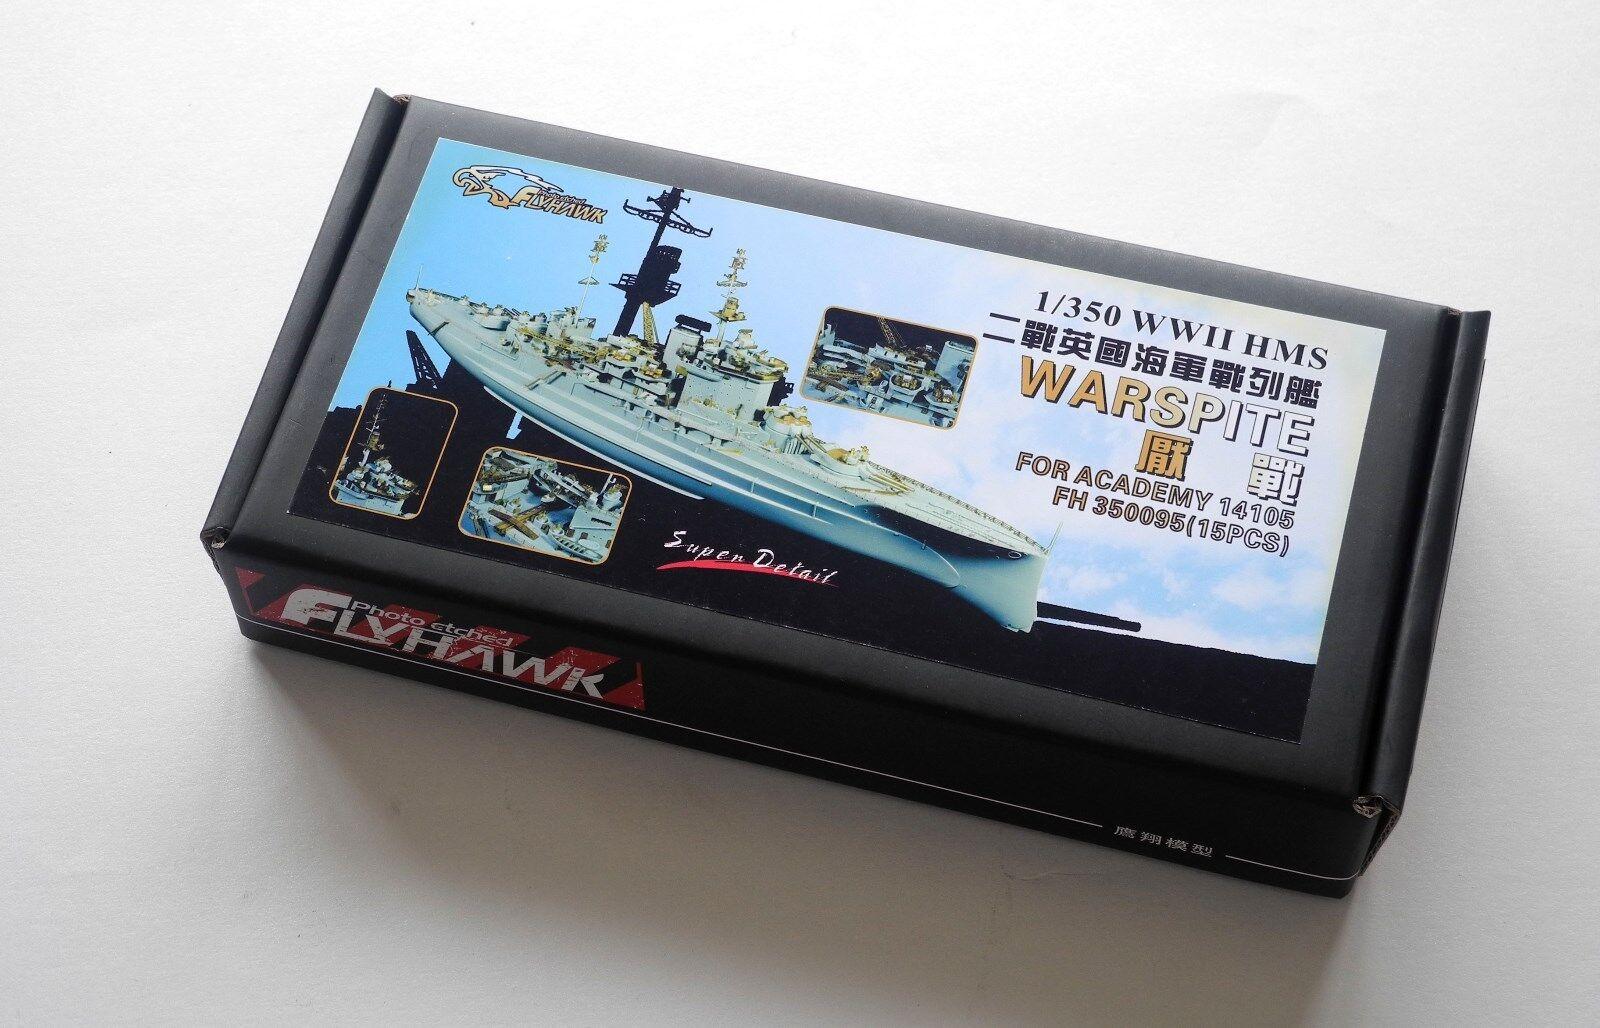 Flyhawk 1 350 350095 HMS Warspit for Academy